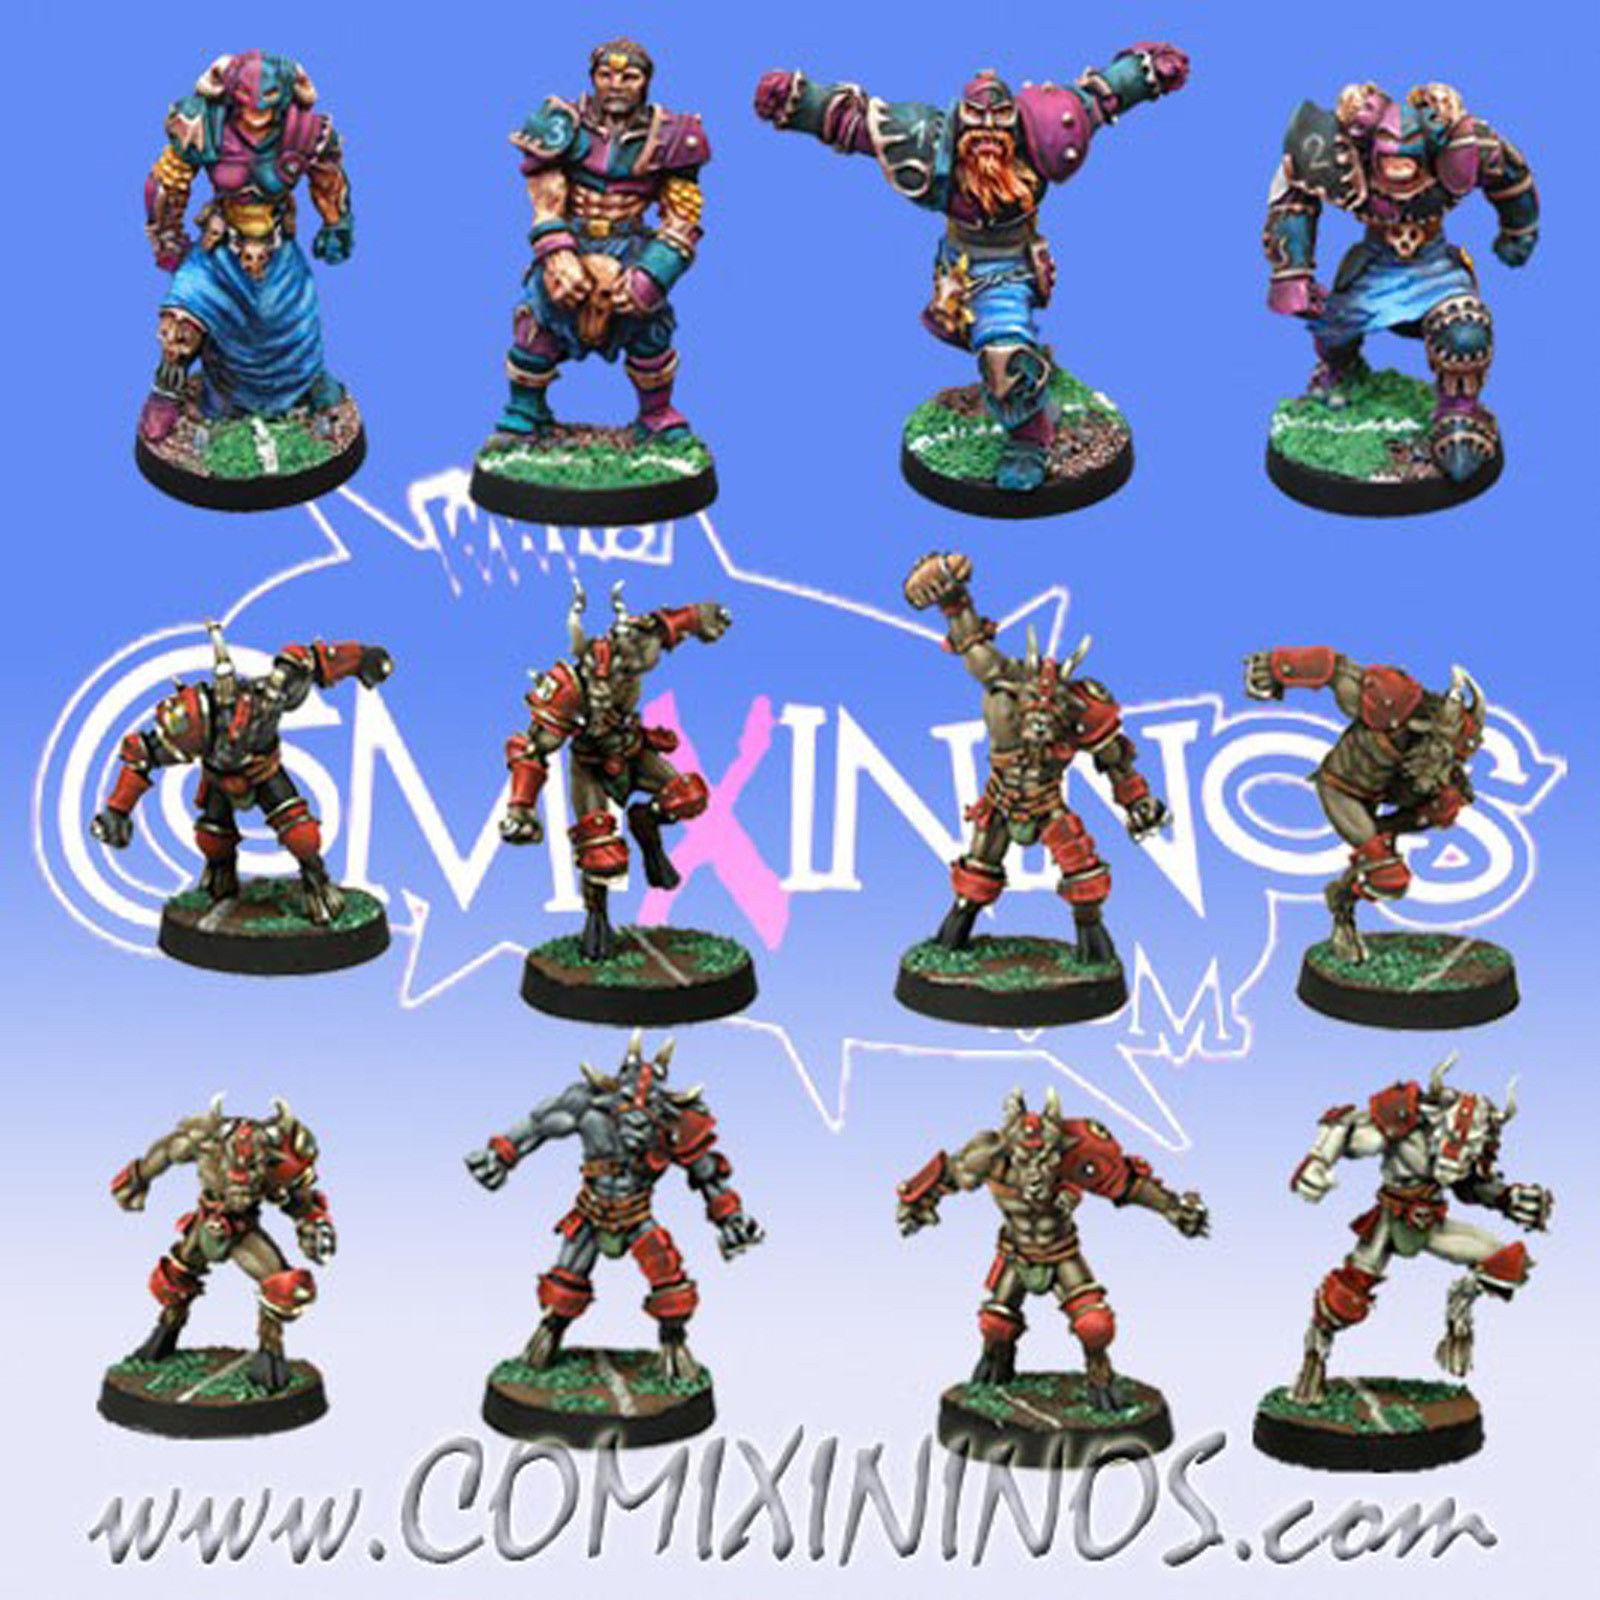 fantasyc Footbtutti - CHAOS squadra 12 Players for Blood Bowl  - Meiko uomoo di Porco  per il commercio all'ingrosso